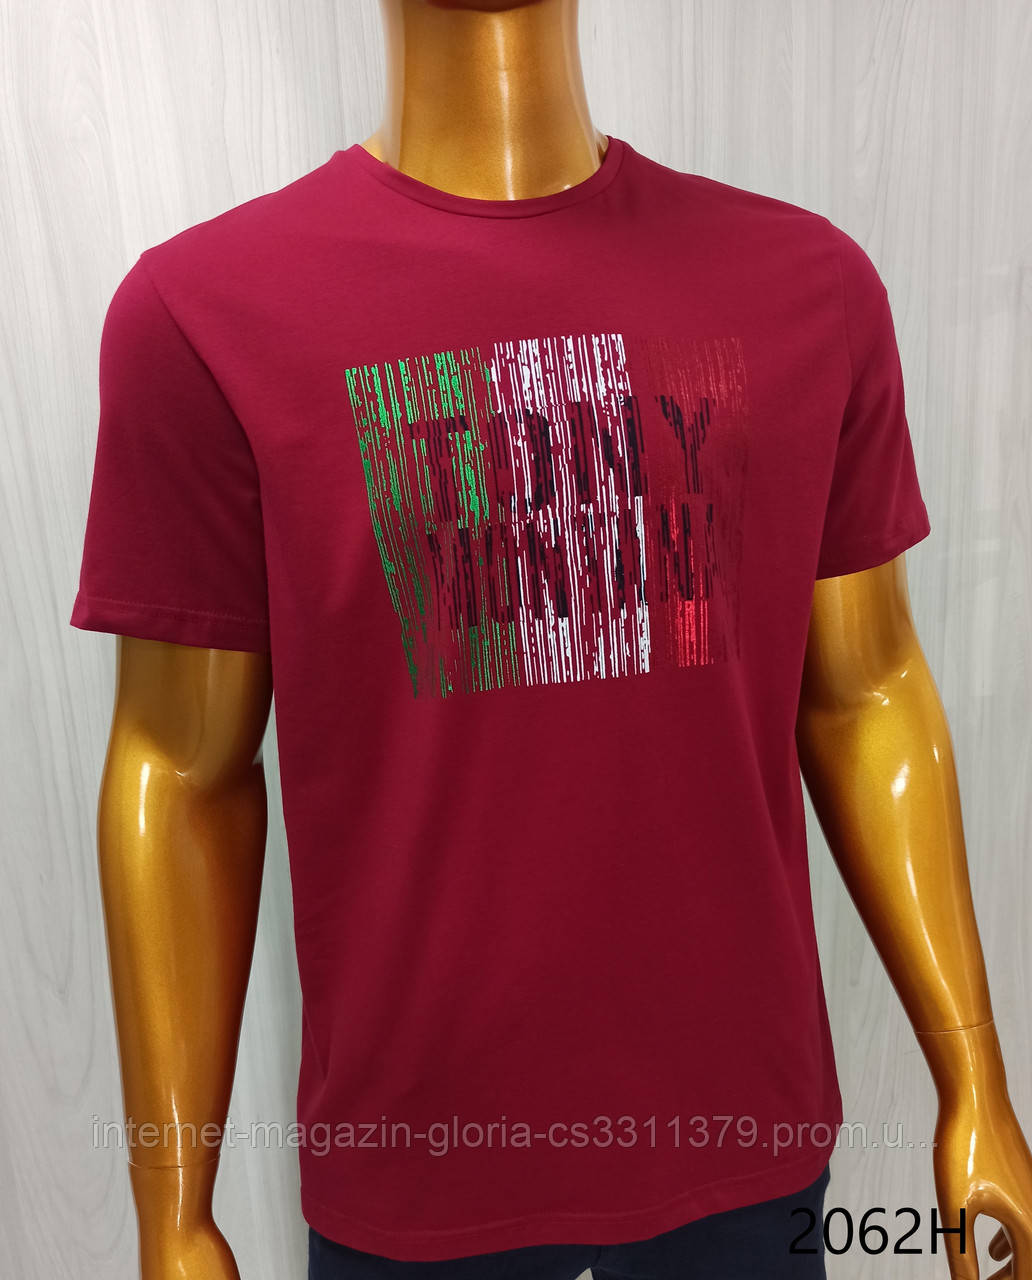 Мужская футболка Tony Montana. MSL-2062(b). Размеры: M,L,XL,XXL.